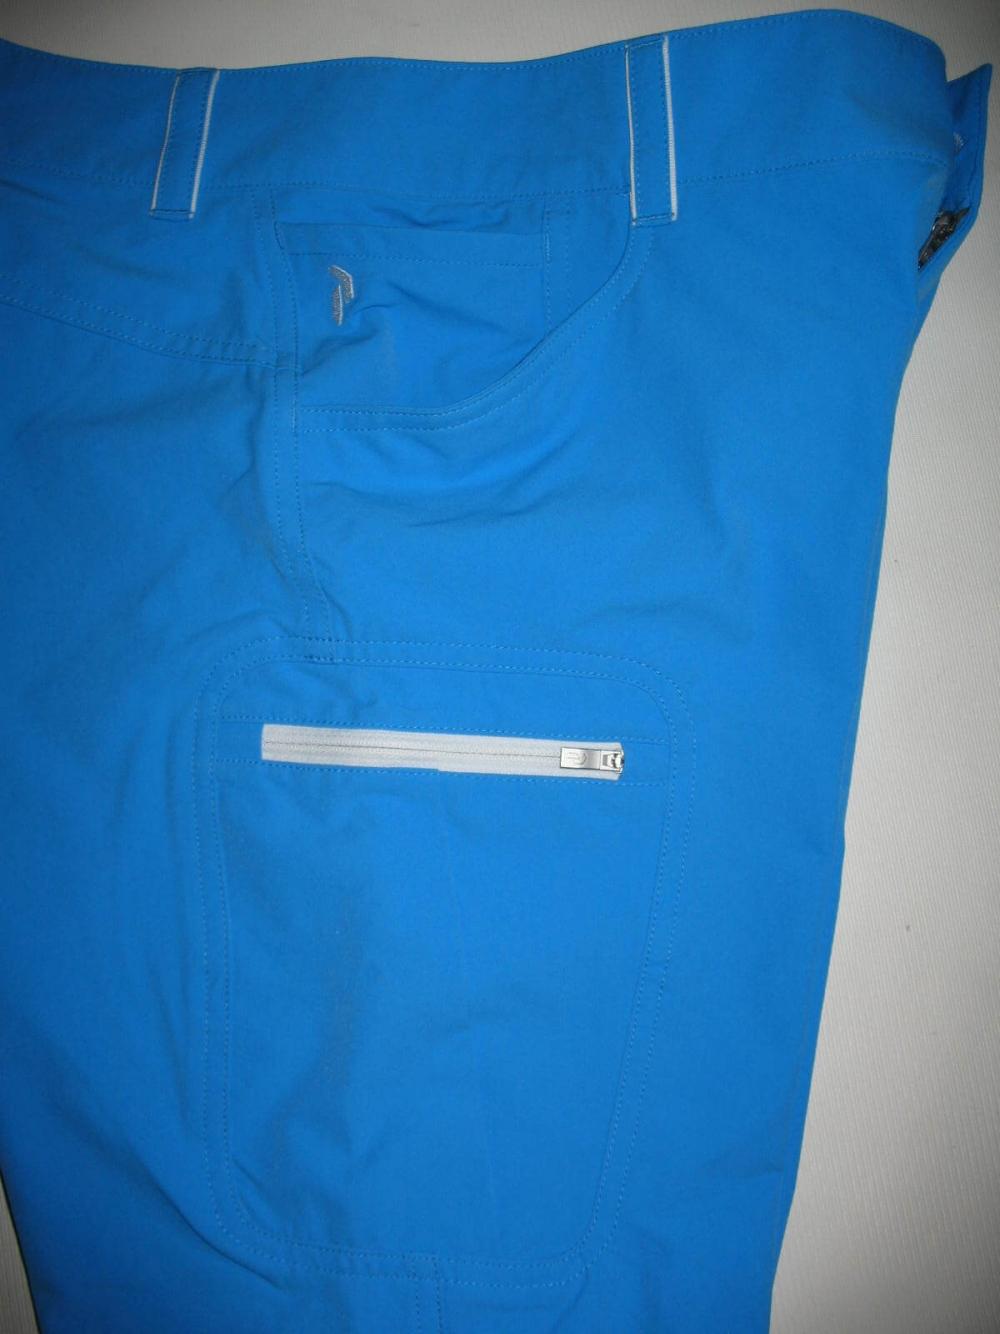 Шорты PEAK PERFOMANCE agile shorts lady (размер M) - 4